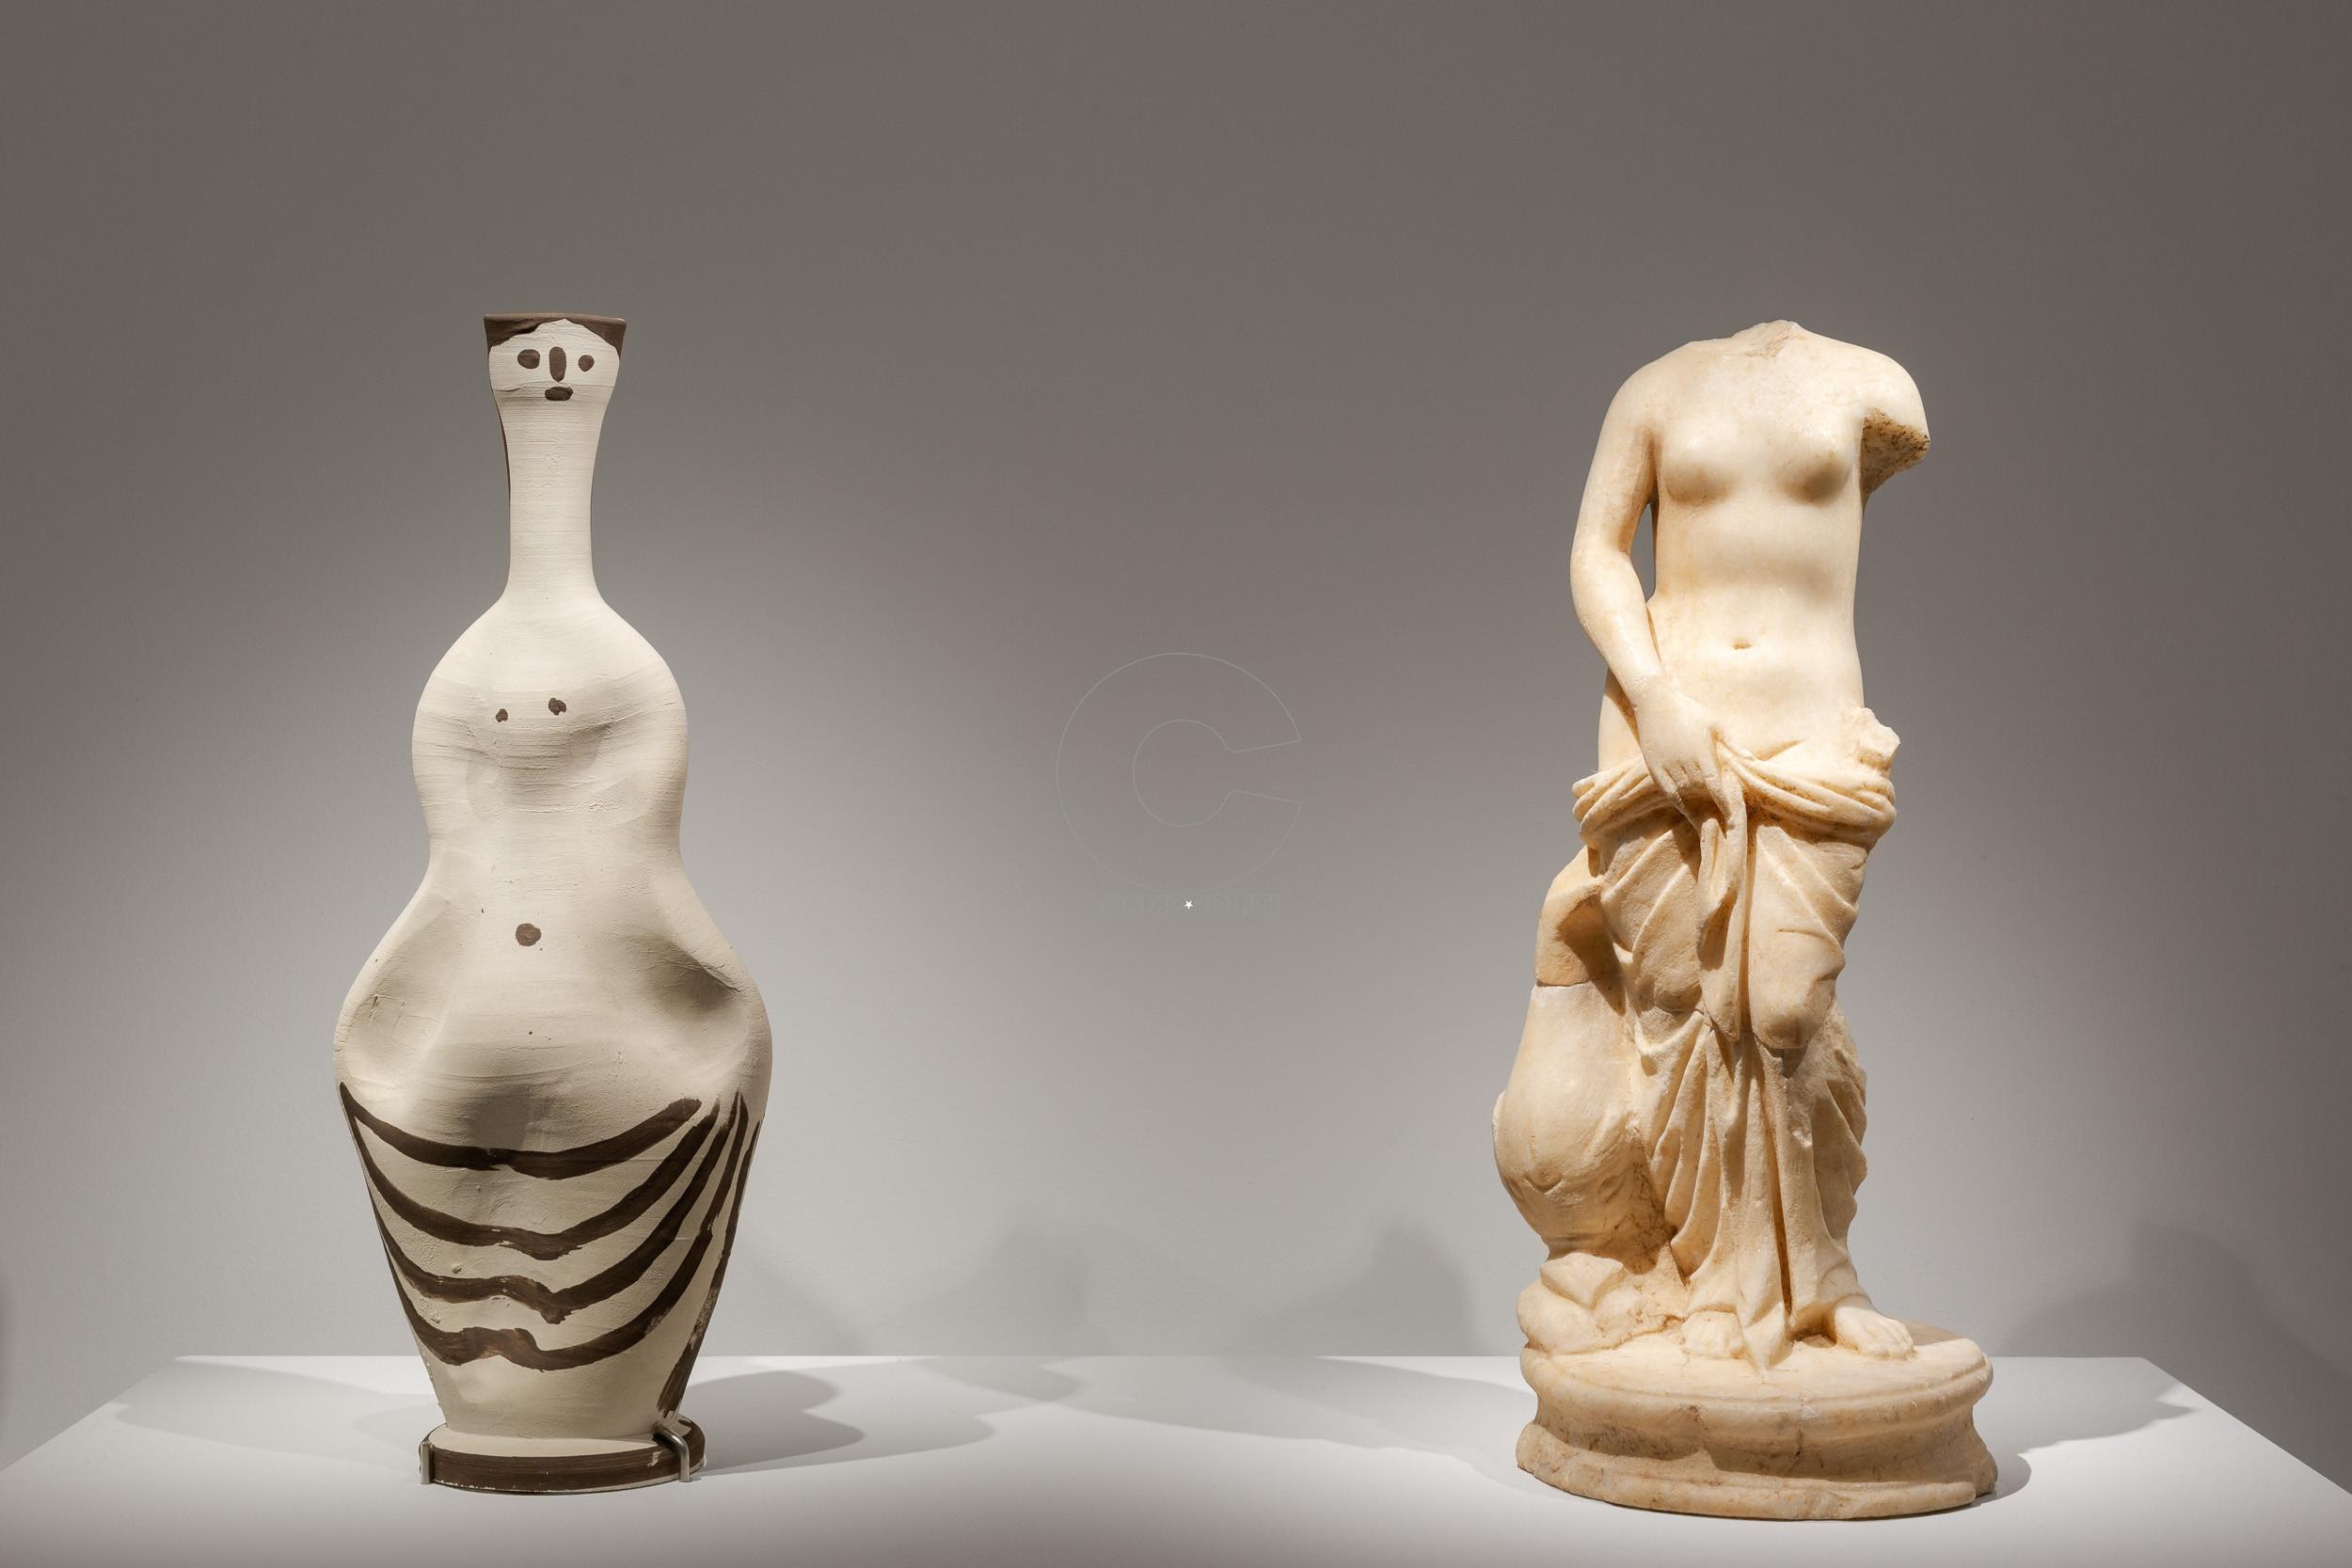 3_MUSEUM OF CYCLADIC ART© PHOTO PARIS TAVITIAN